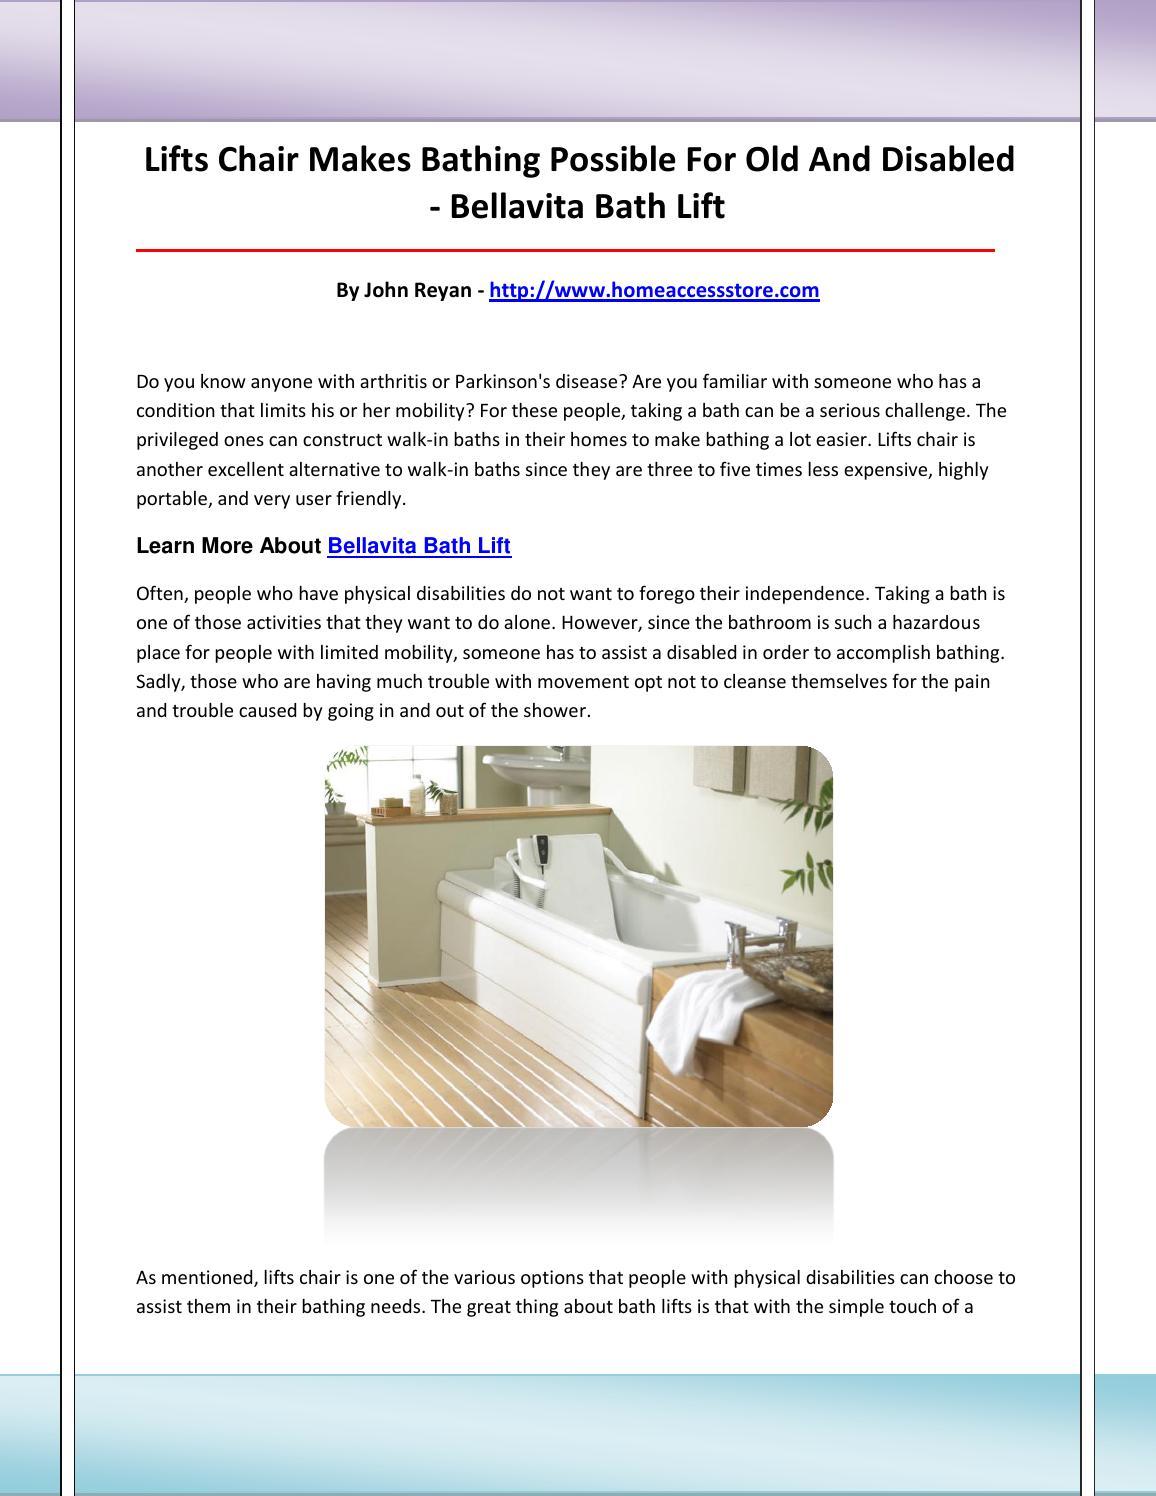 Bellavita Bath Lift By Bellavitabathlift Issuu